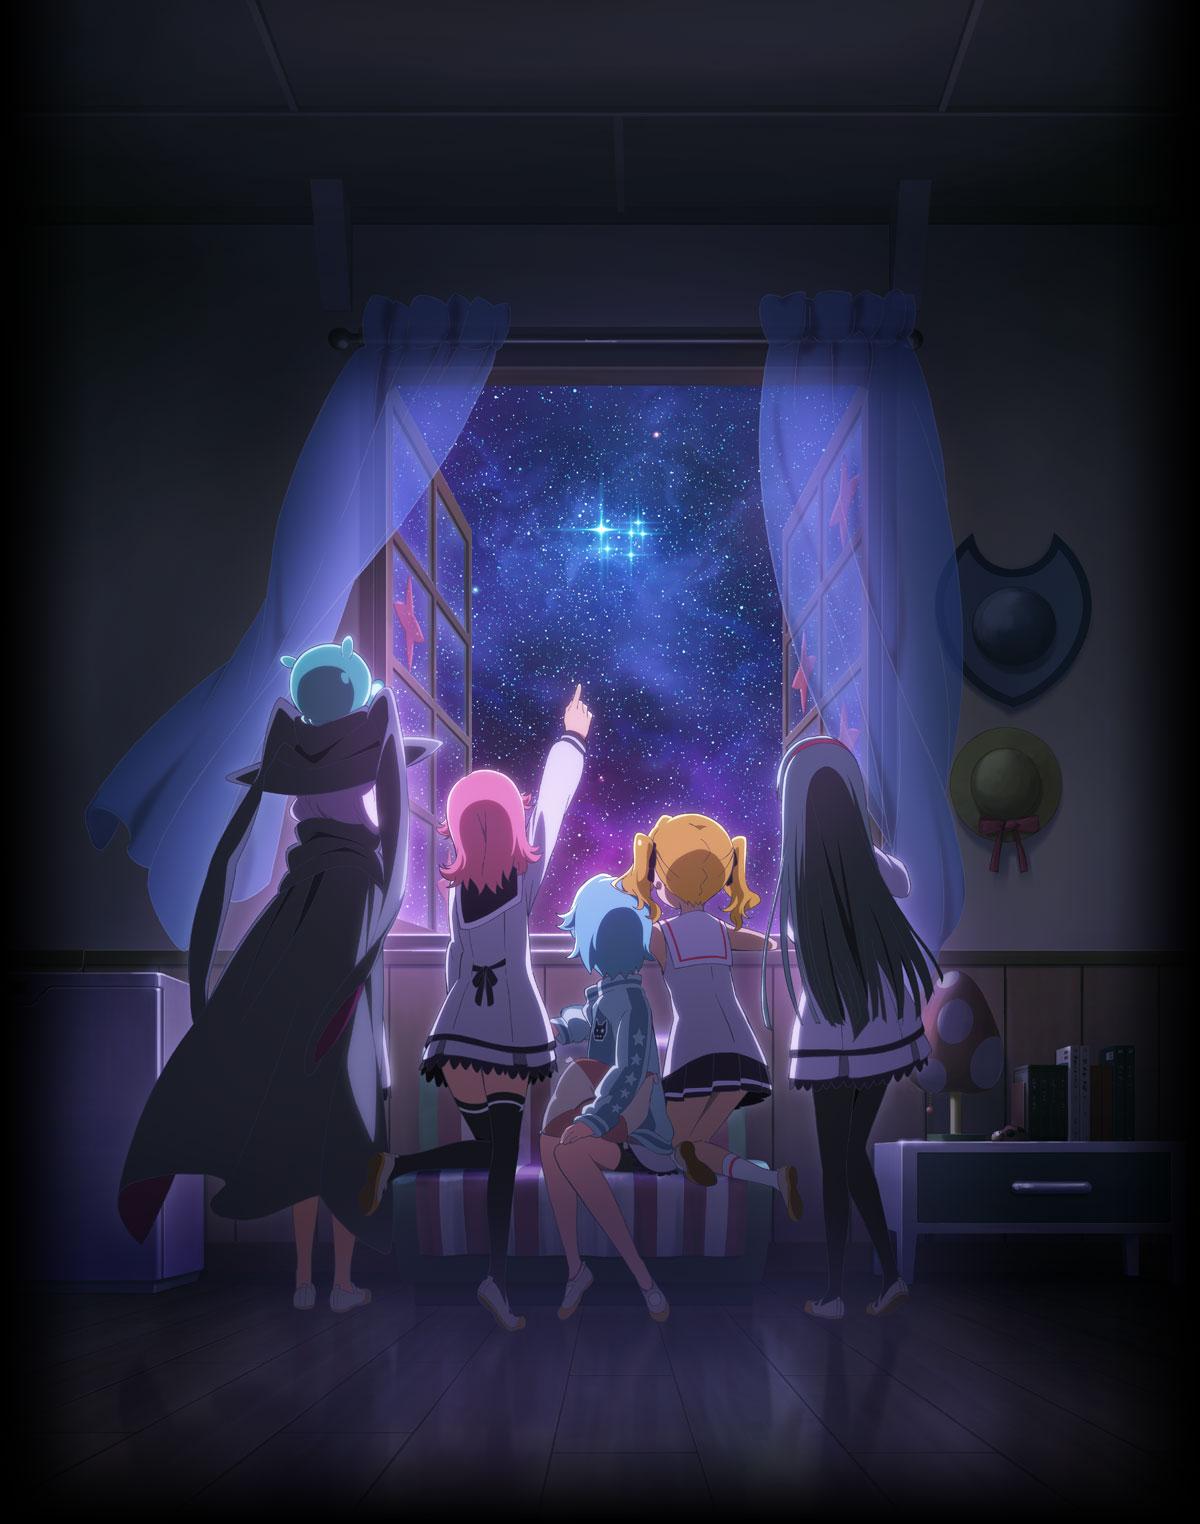 141217(1) - 闊別4年、「速霸陸×GAINAX」魔法少女動畫《放課後のプレアデス》將於明年春天放送!